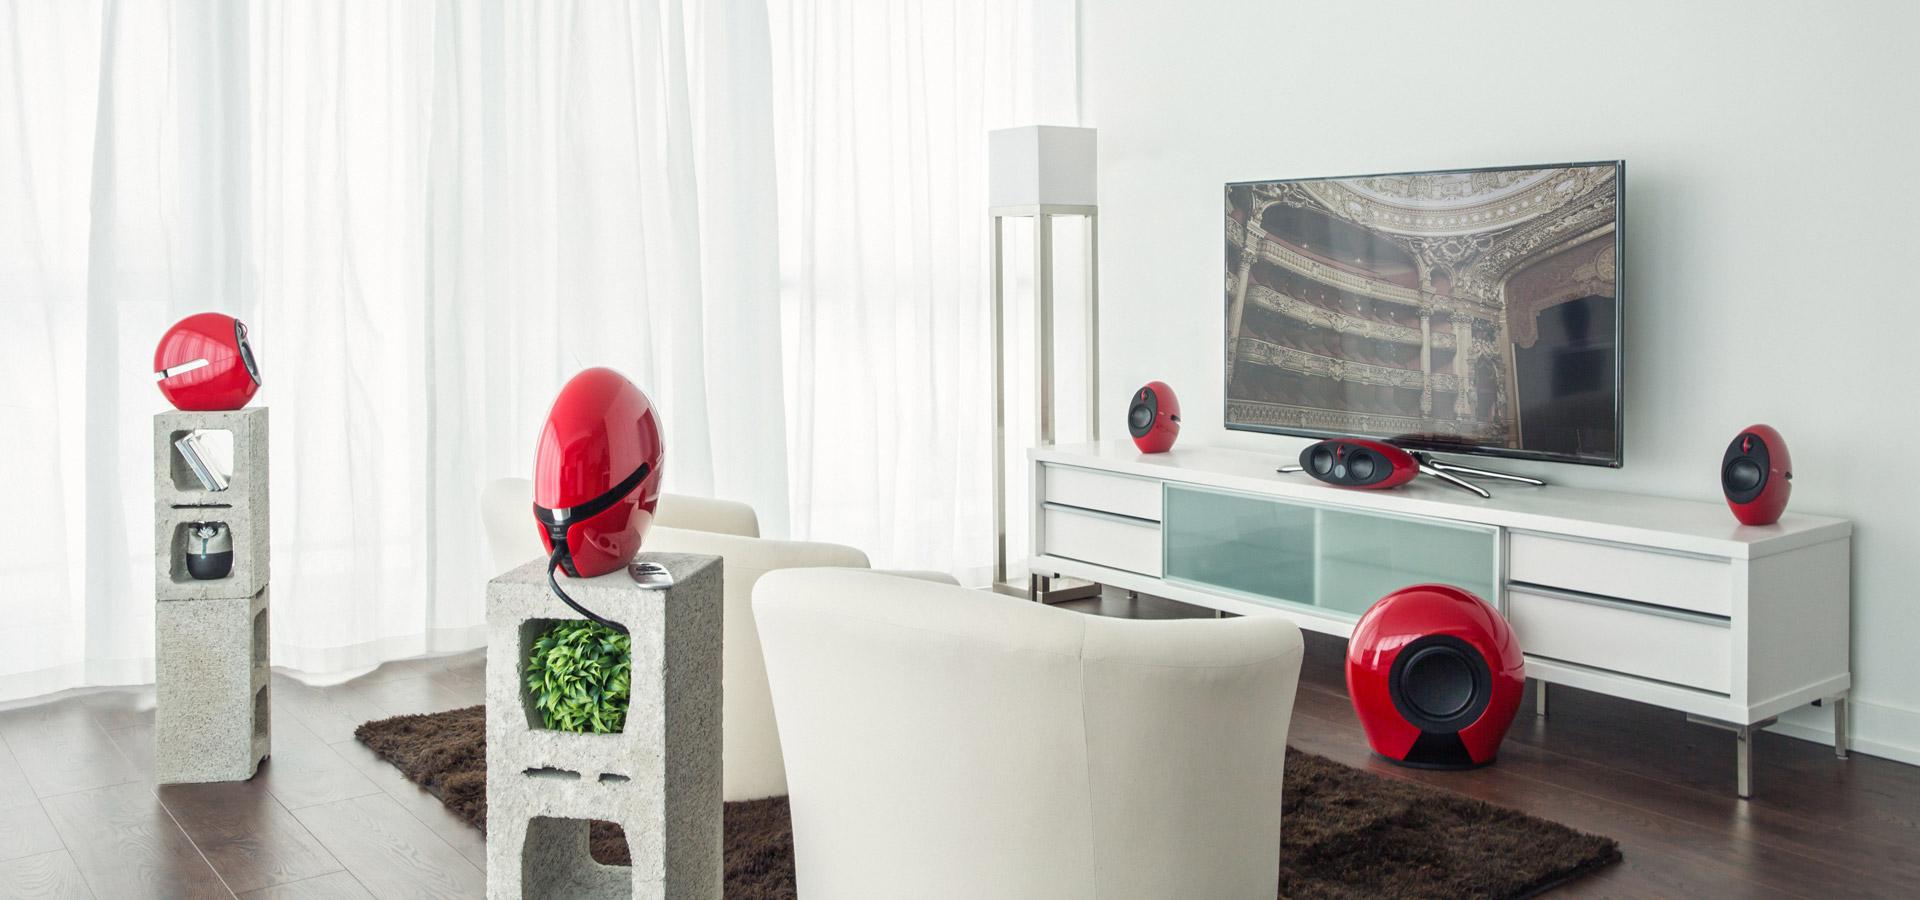 e255 Home Theater 5.1 Surround Sound Speakers - Edifier USA